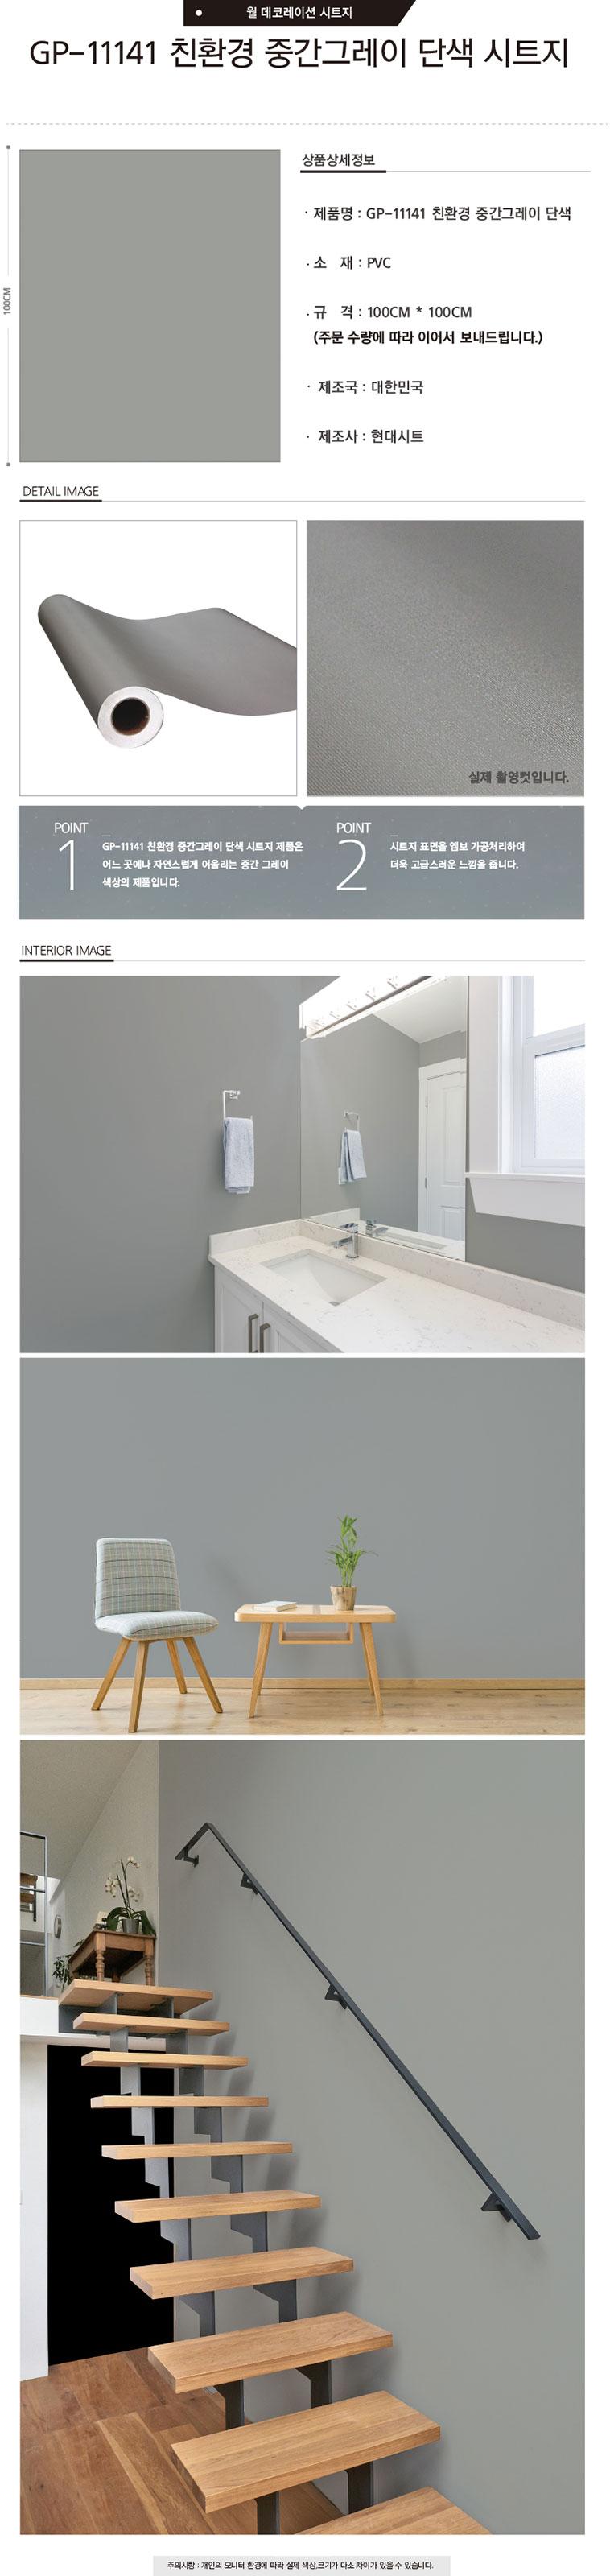 GP-11141 중간그레이 단색 포인트벽지 100x100cm - 케이알인터내셔날, 7,700원, 벽지/시트지, 단색벽지